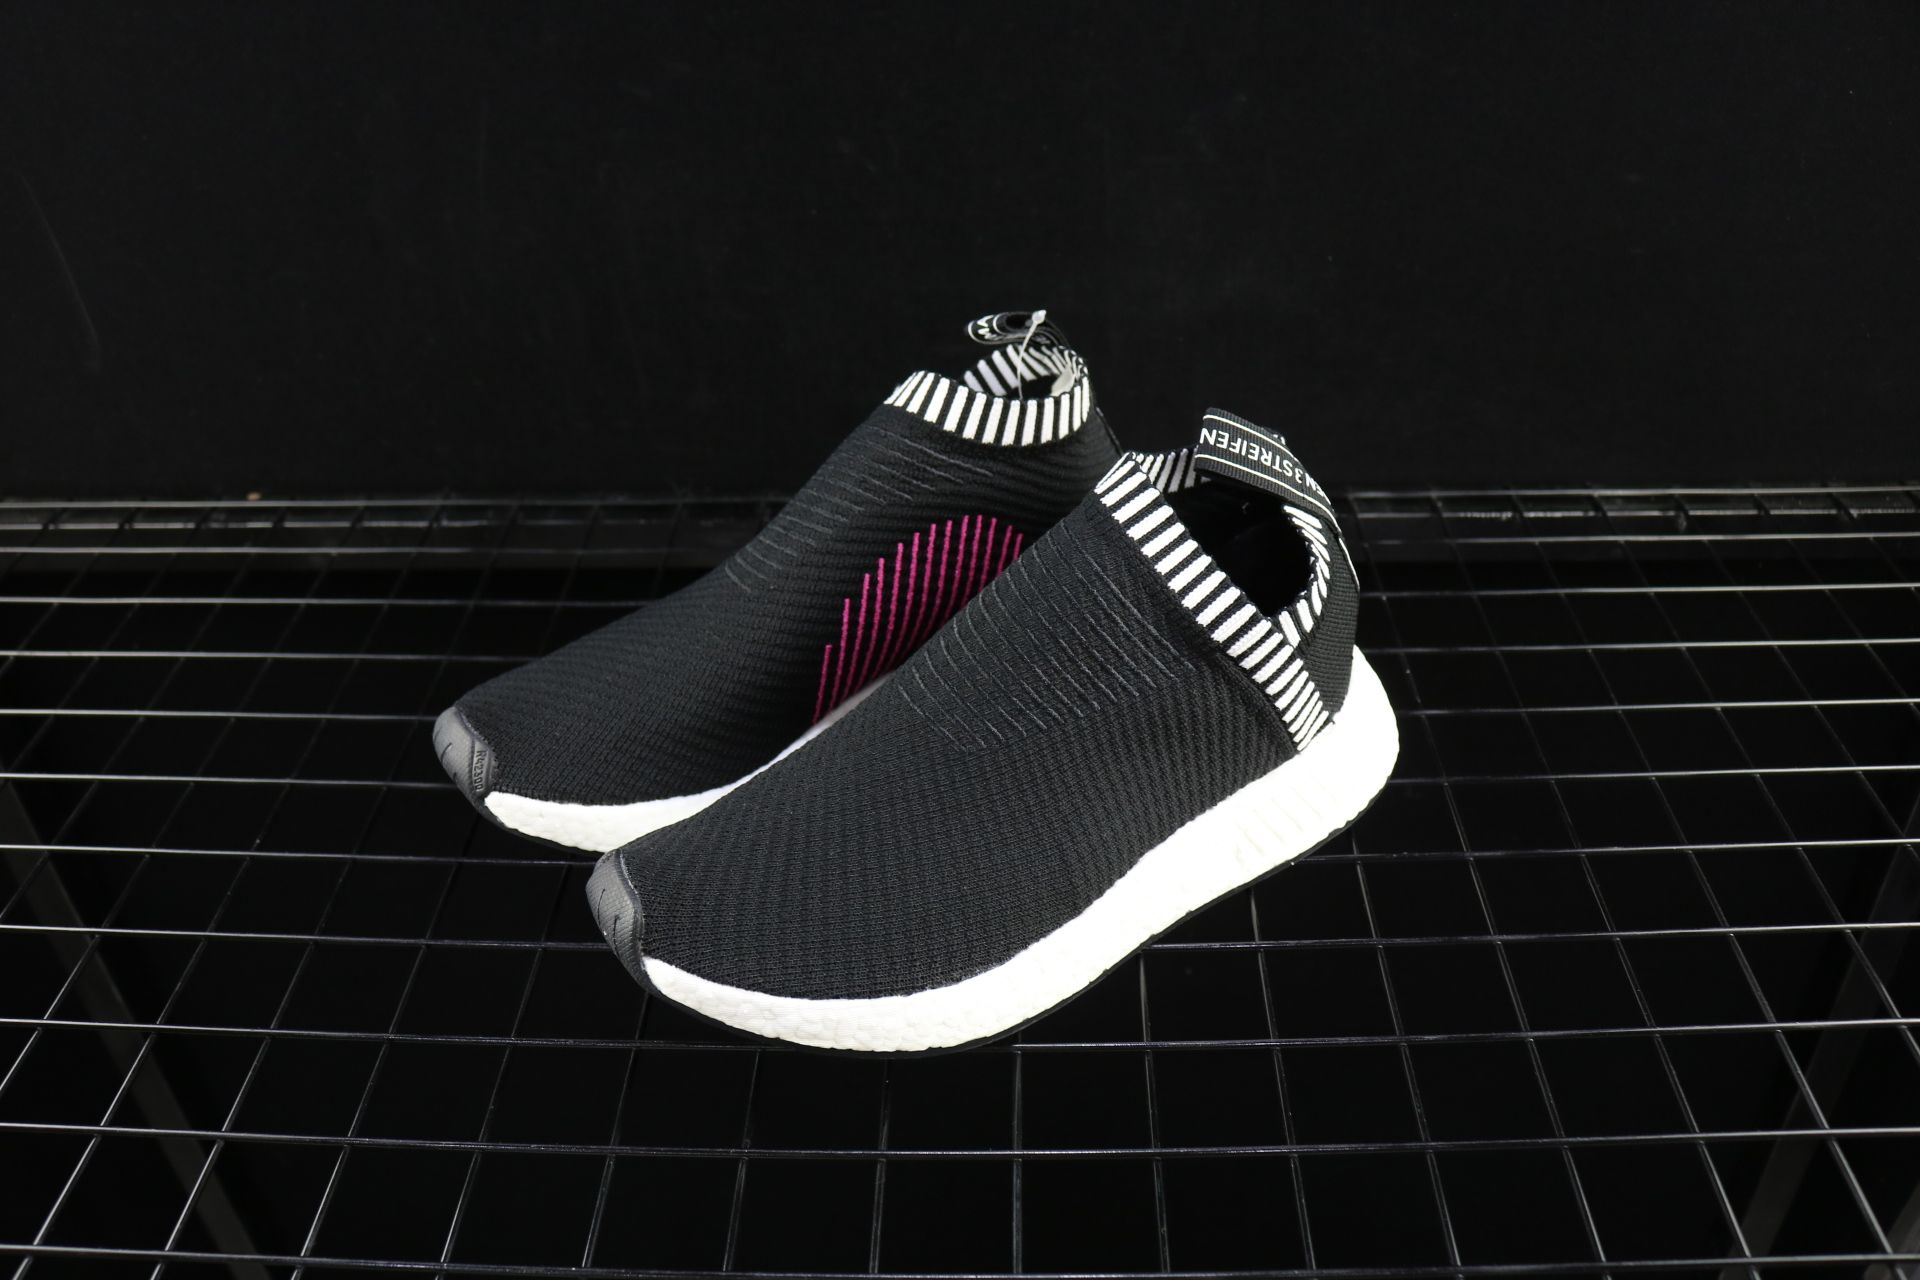 8ef012f95a073 NMD PK Boost City Sock BA7187 Scale black branded women shoes men shoes ladies  shoes lifestyle